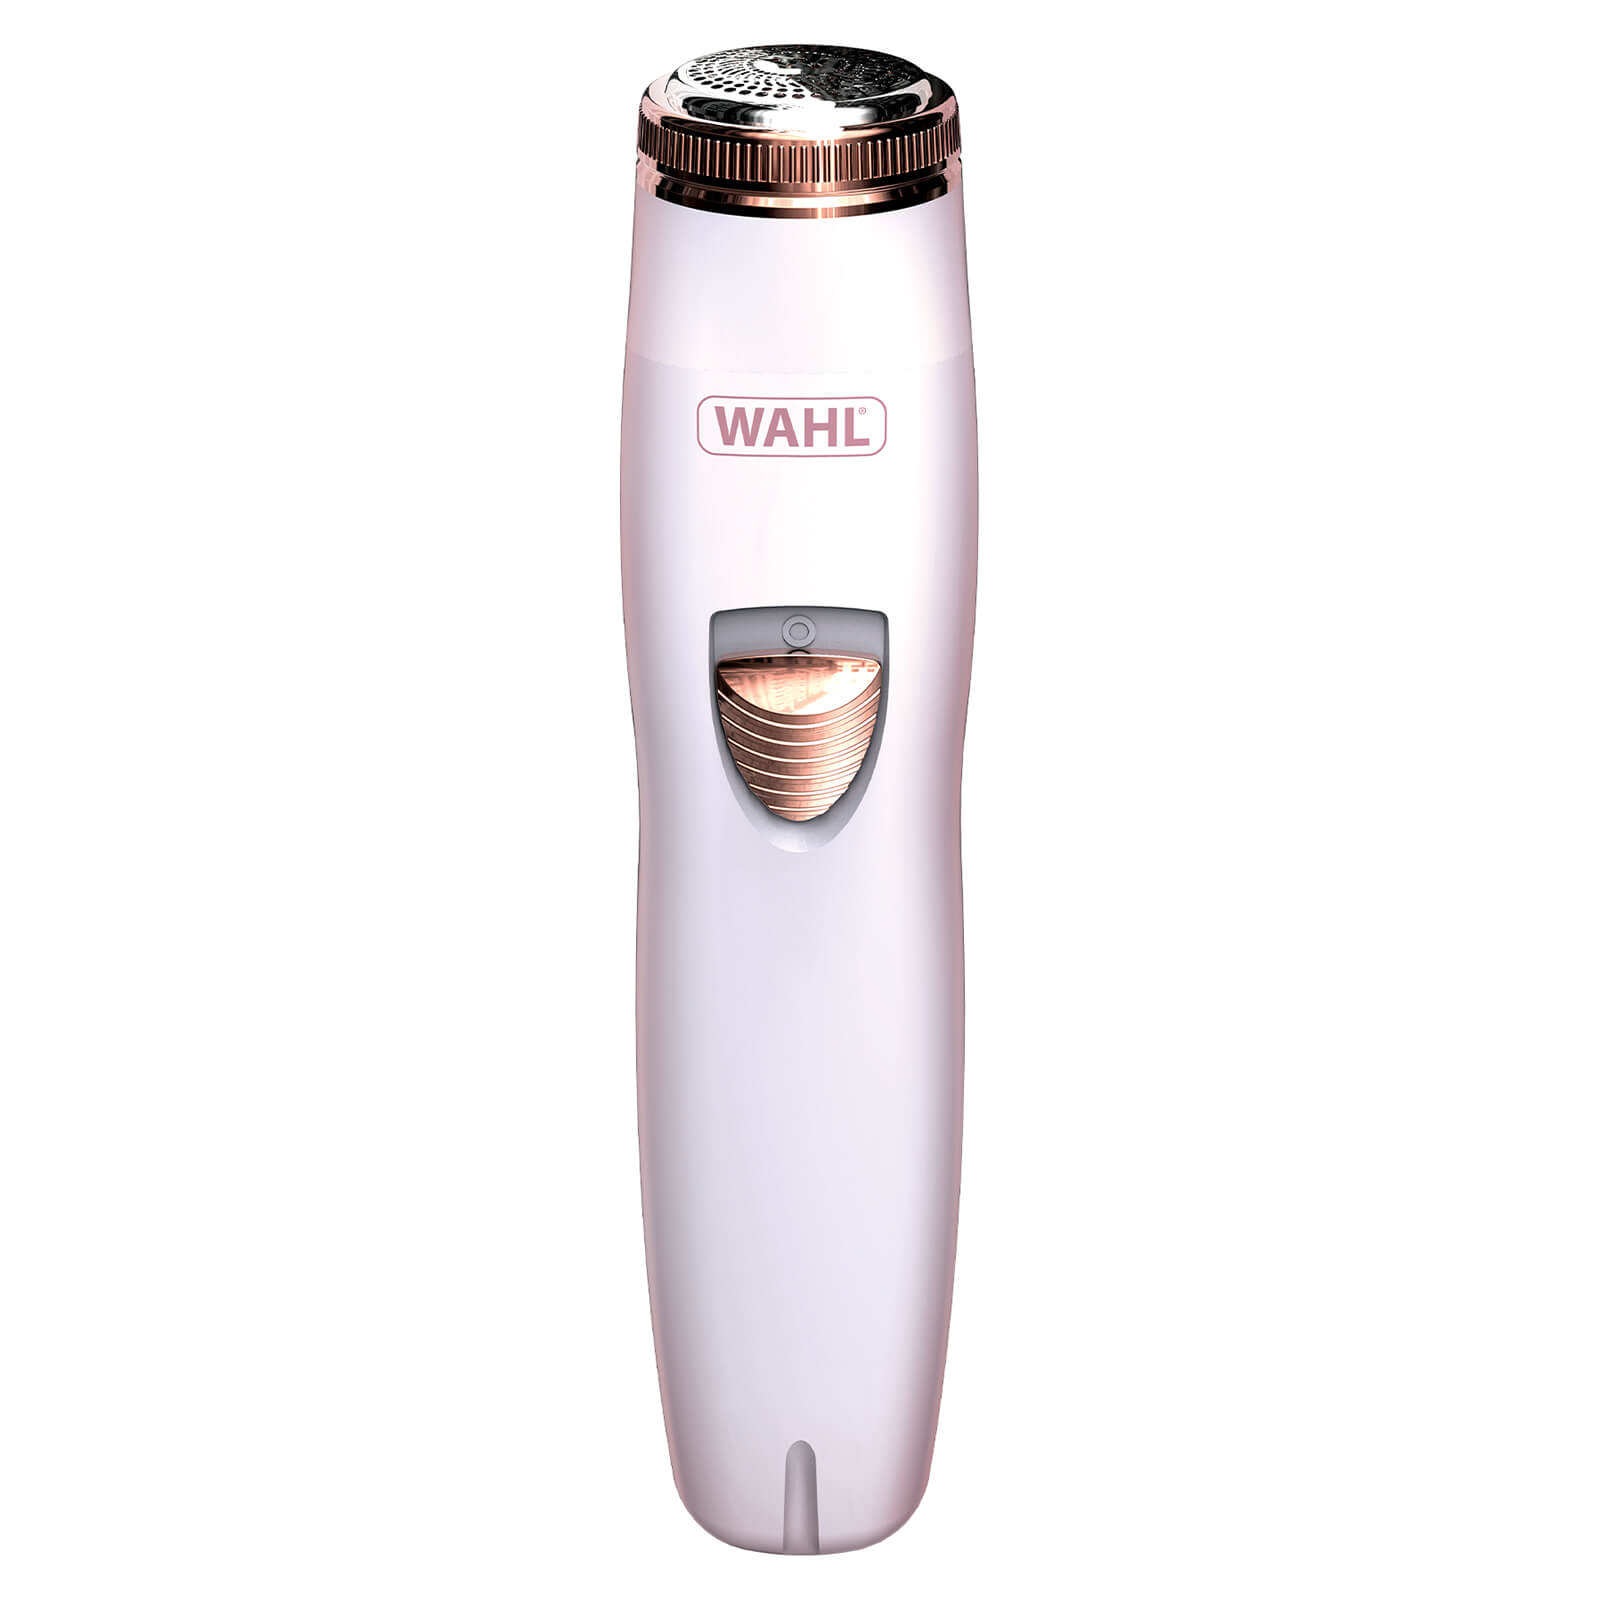 Купить Wahl Trimmer Kit Facial Hair Remover